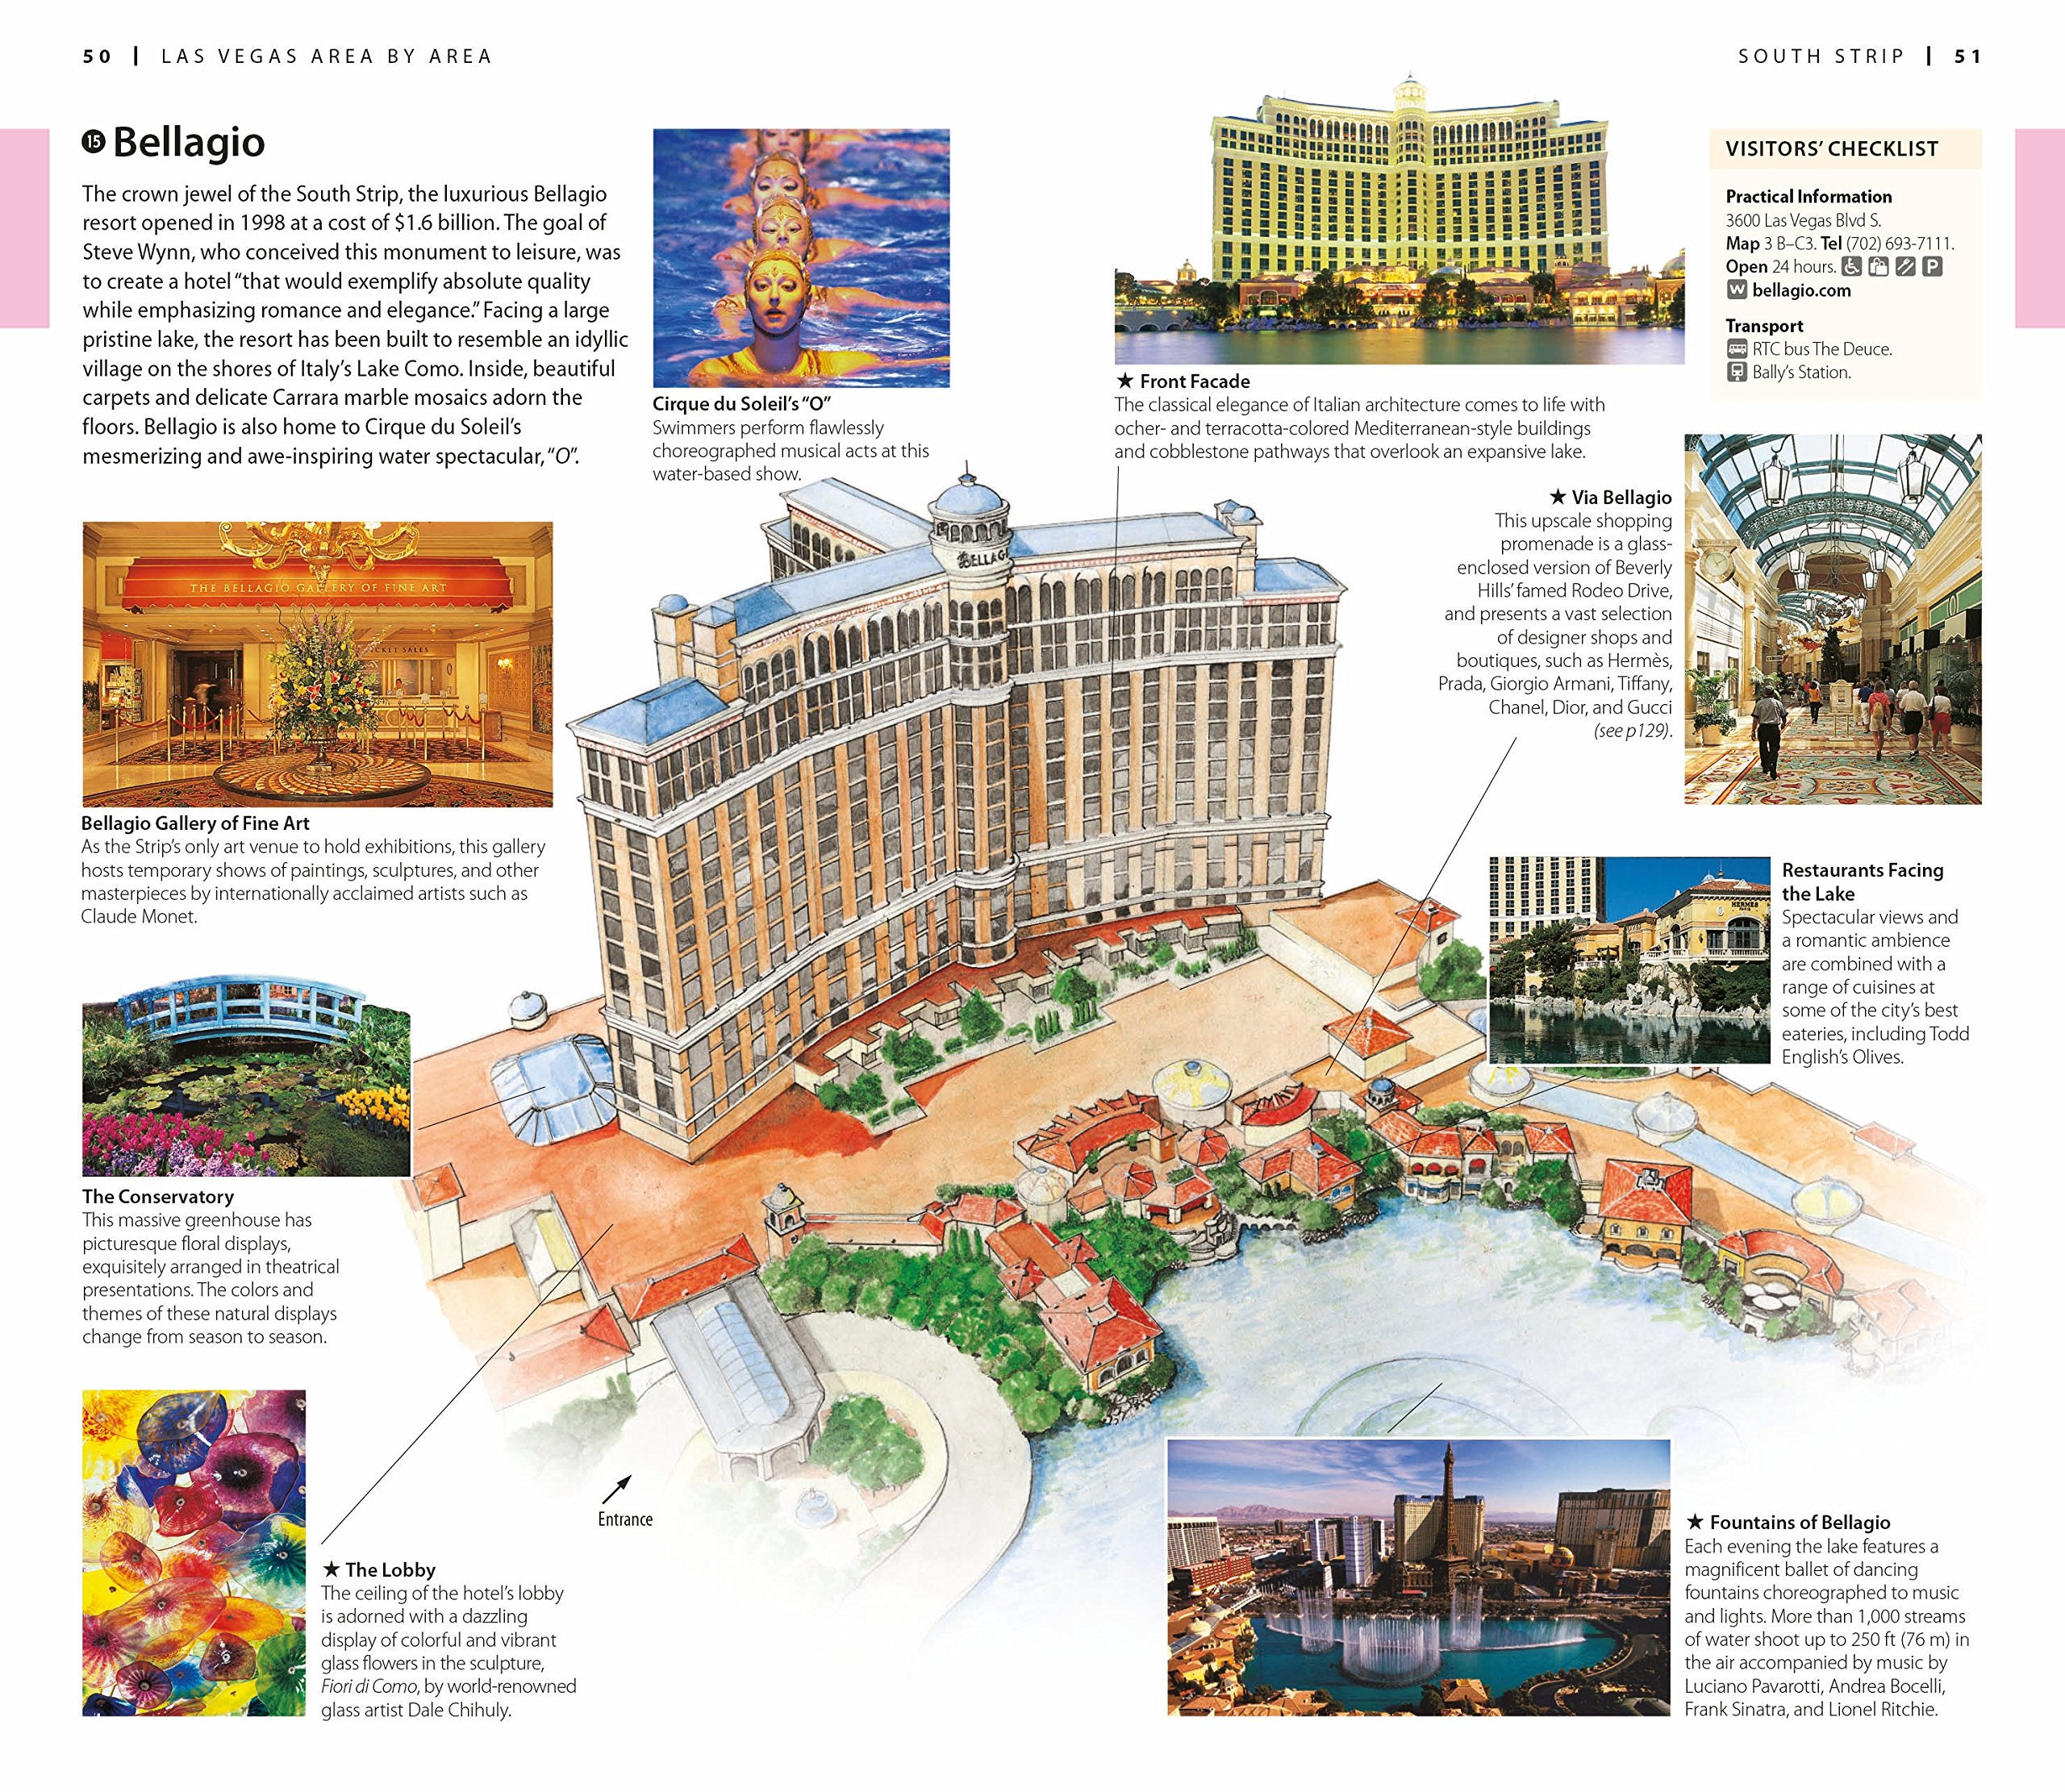 DK Eyewitness Travel Guide Las Vegas  Amazon.co.uk  Dk Travel   9781465460349  Books 8190341887a8